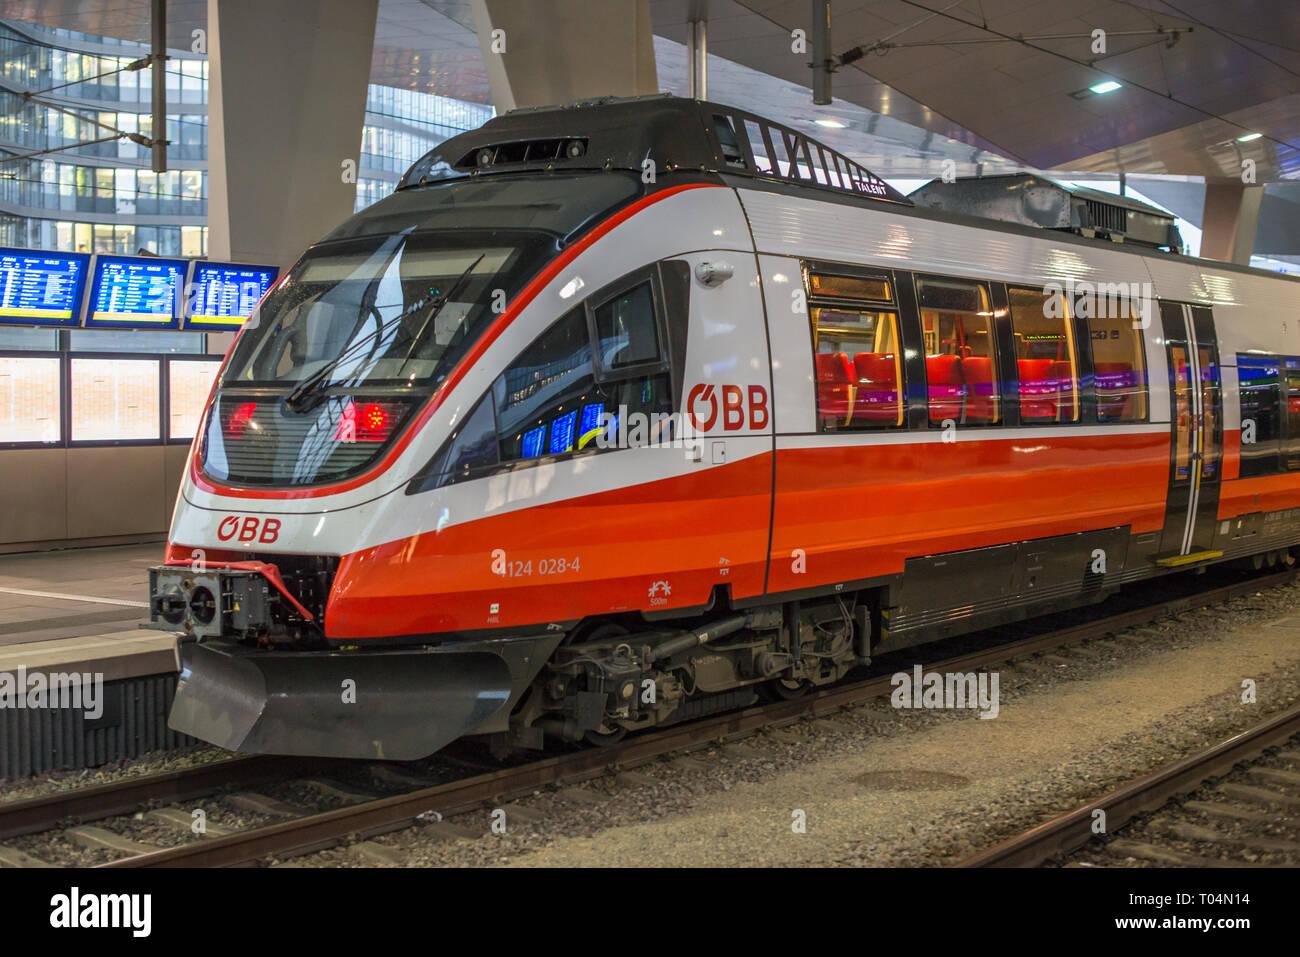 ÖBB Talent railcar approaching platform at Vienna Central station Hauptbanhauf, Austria. - Stock Image